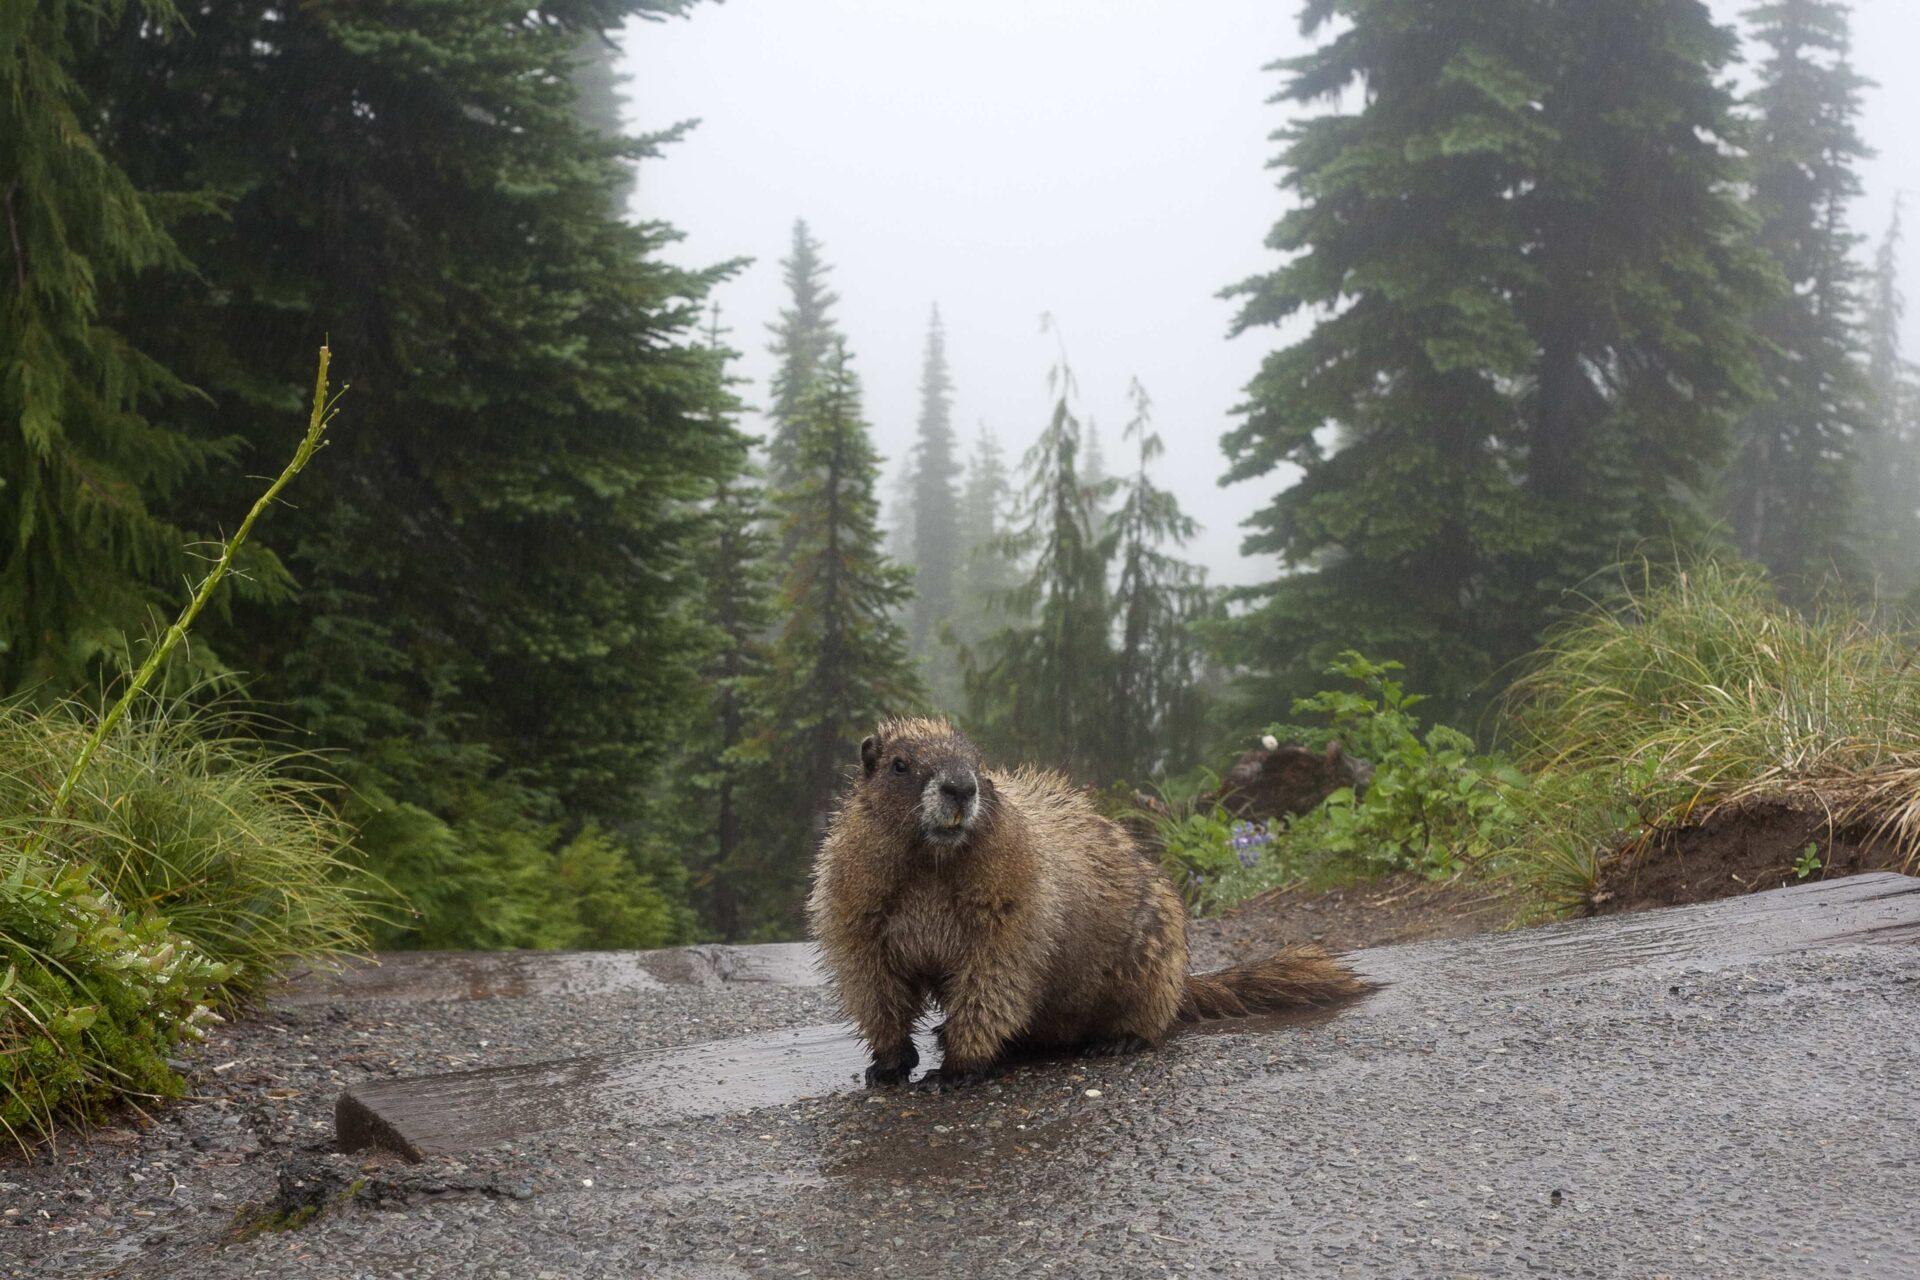 Beaver in a park trail Hinton